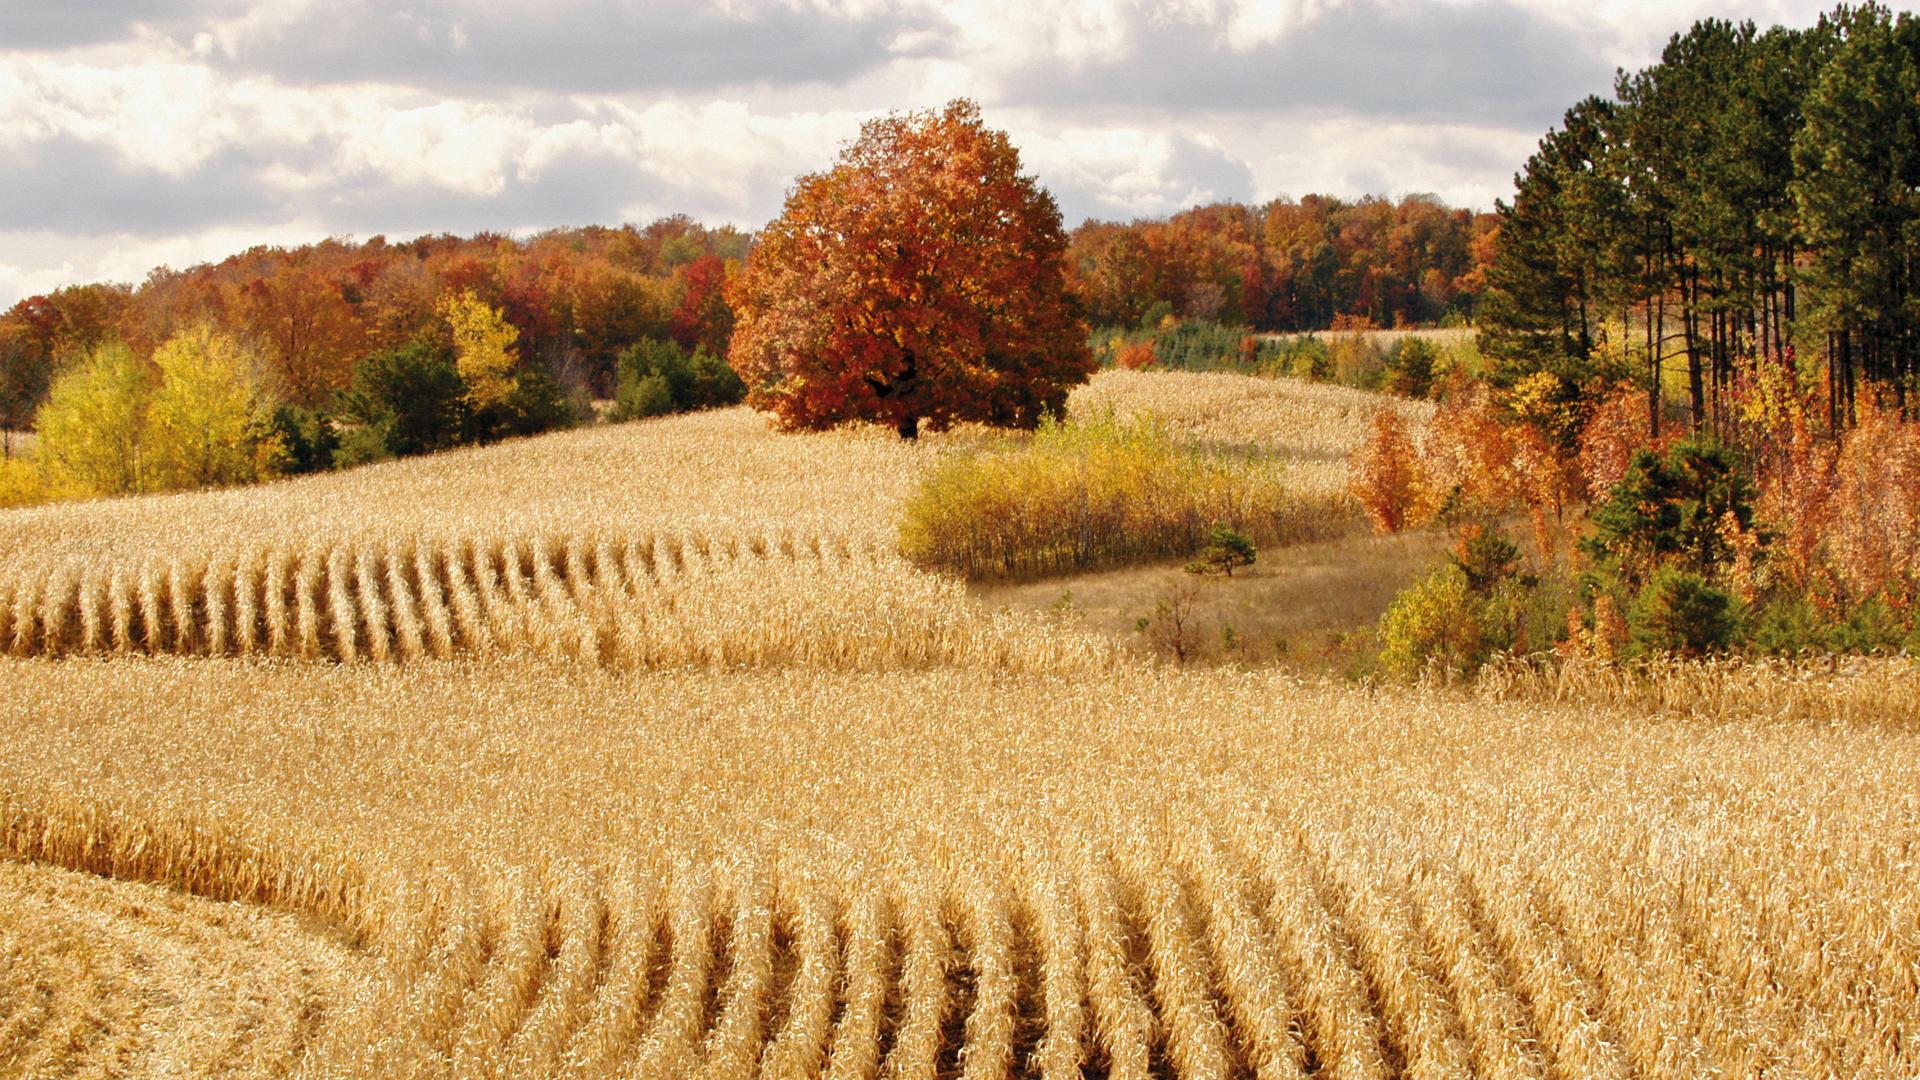 Fall Harvest Wallpaper 1024x768 Moon Wallpaper 1024x768 47229